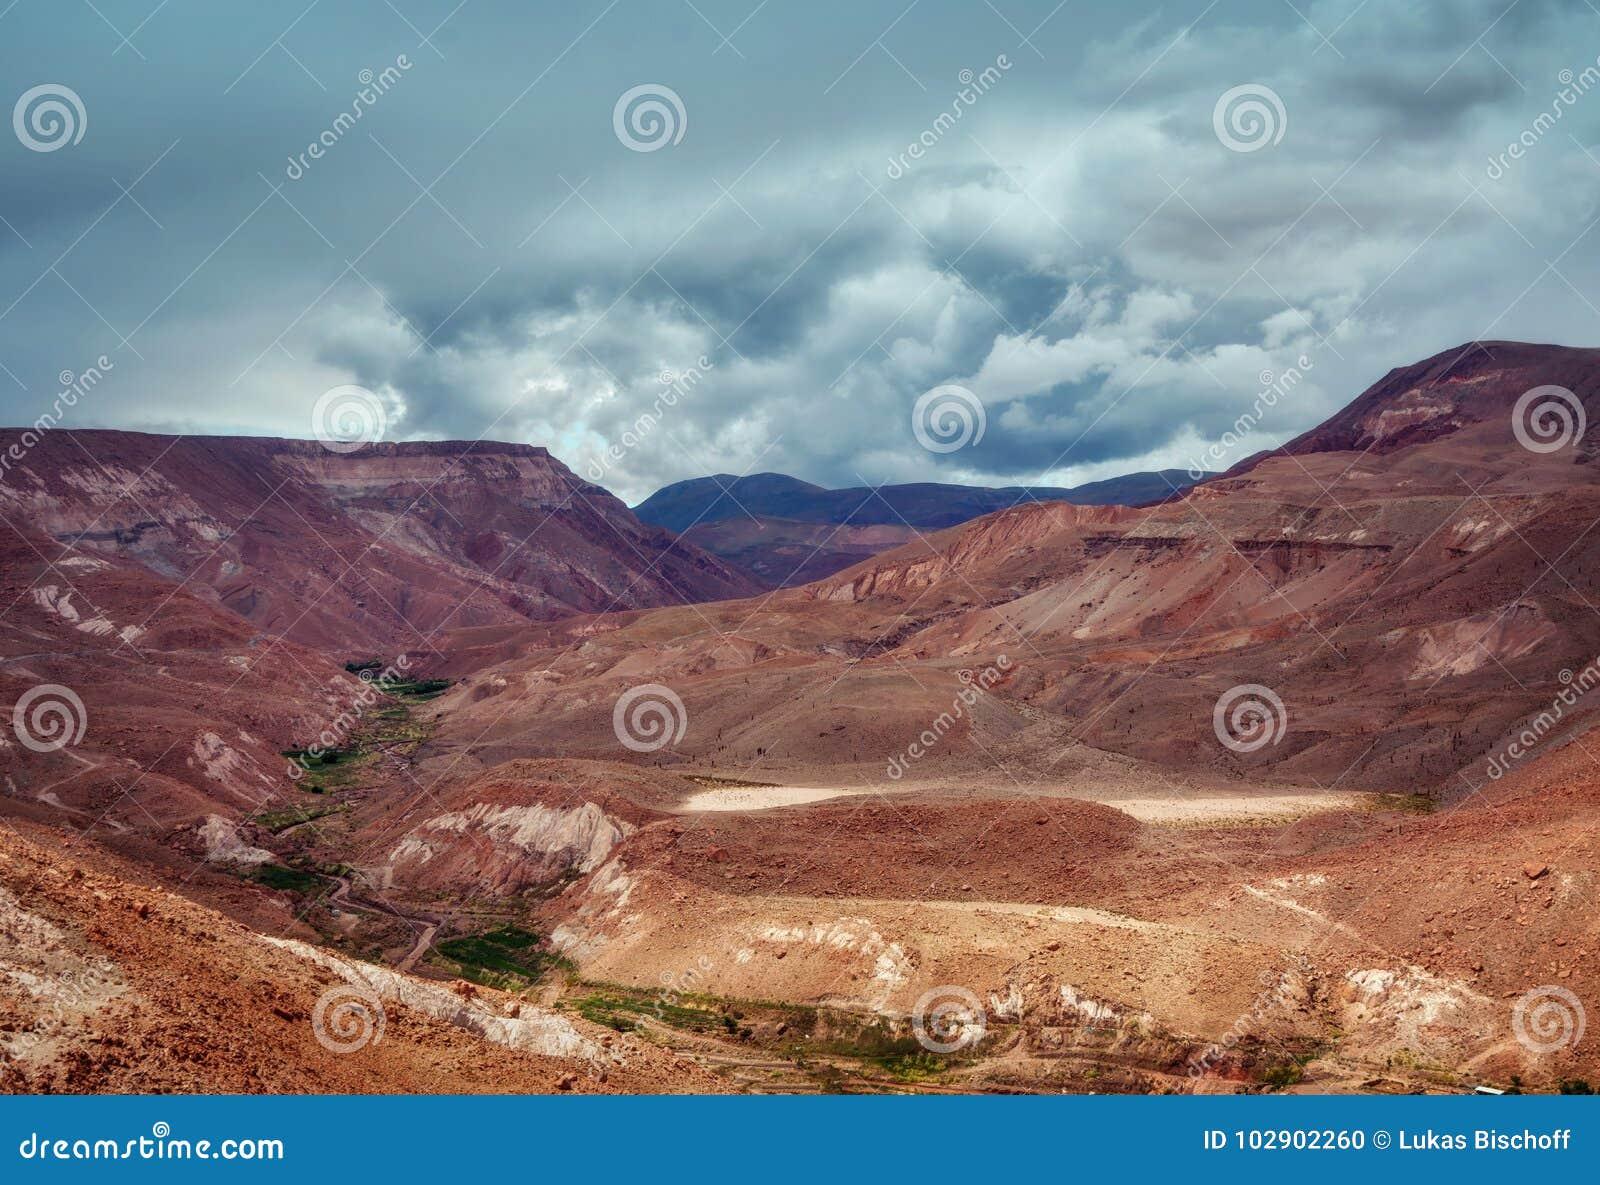 Valle Del Arcoiris Chile